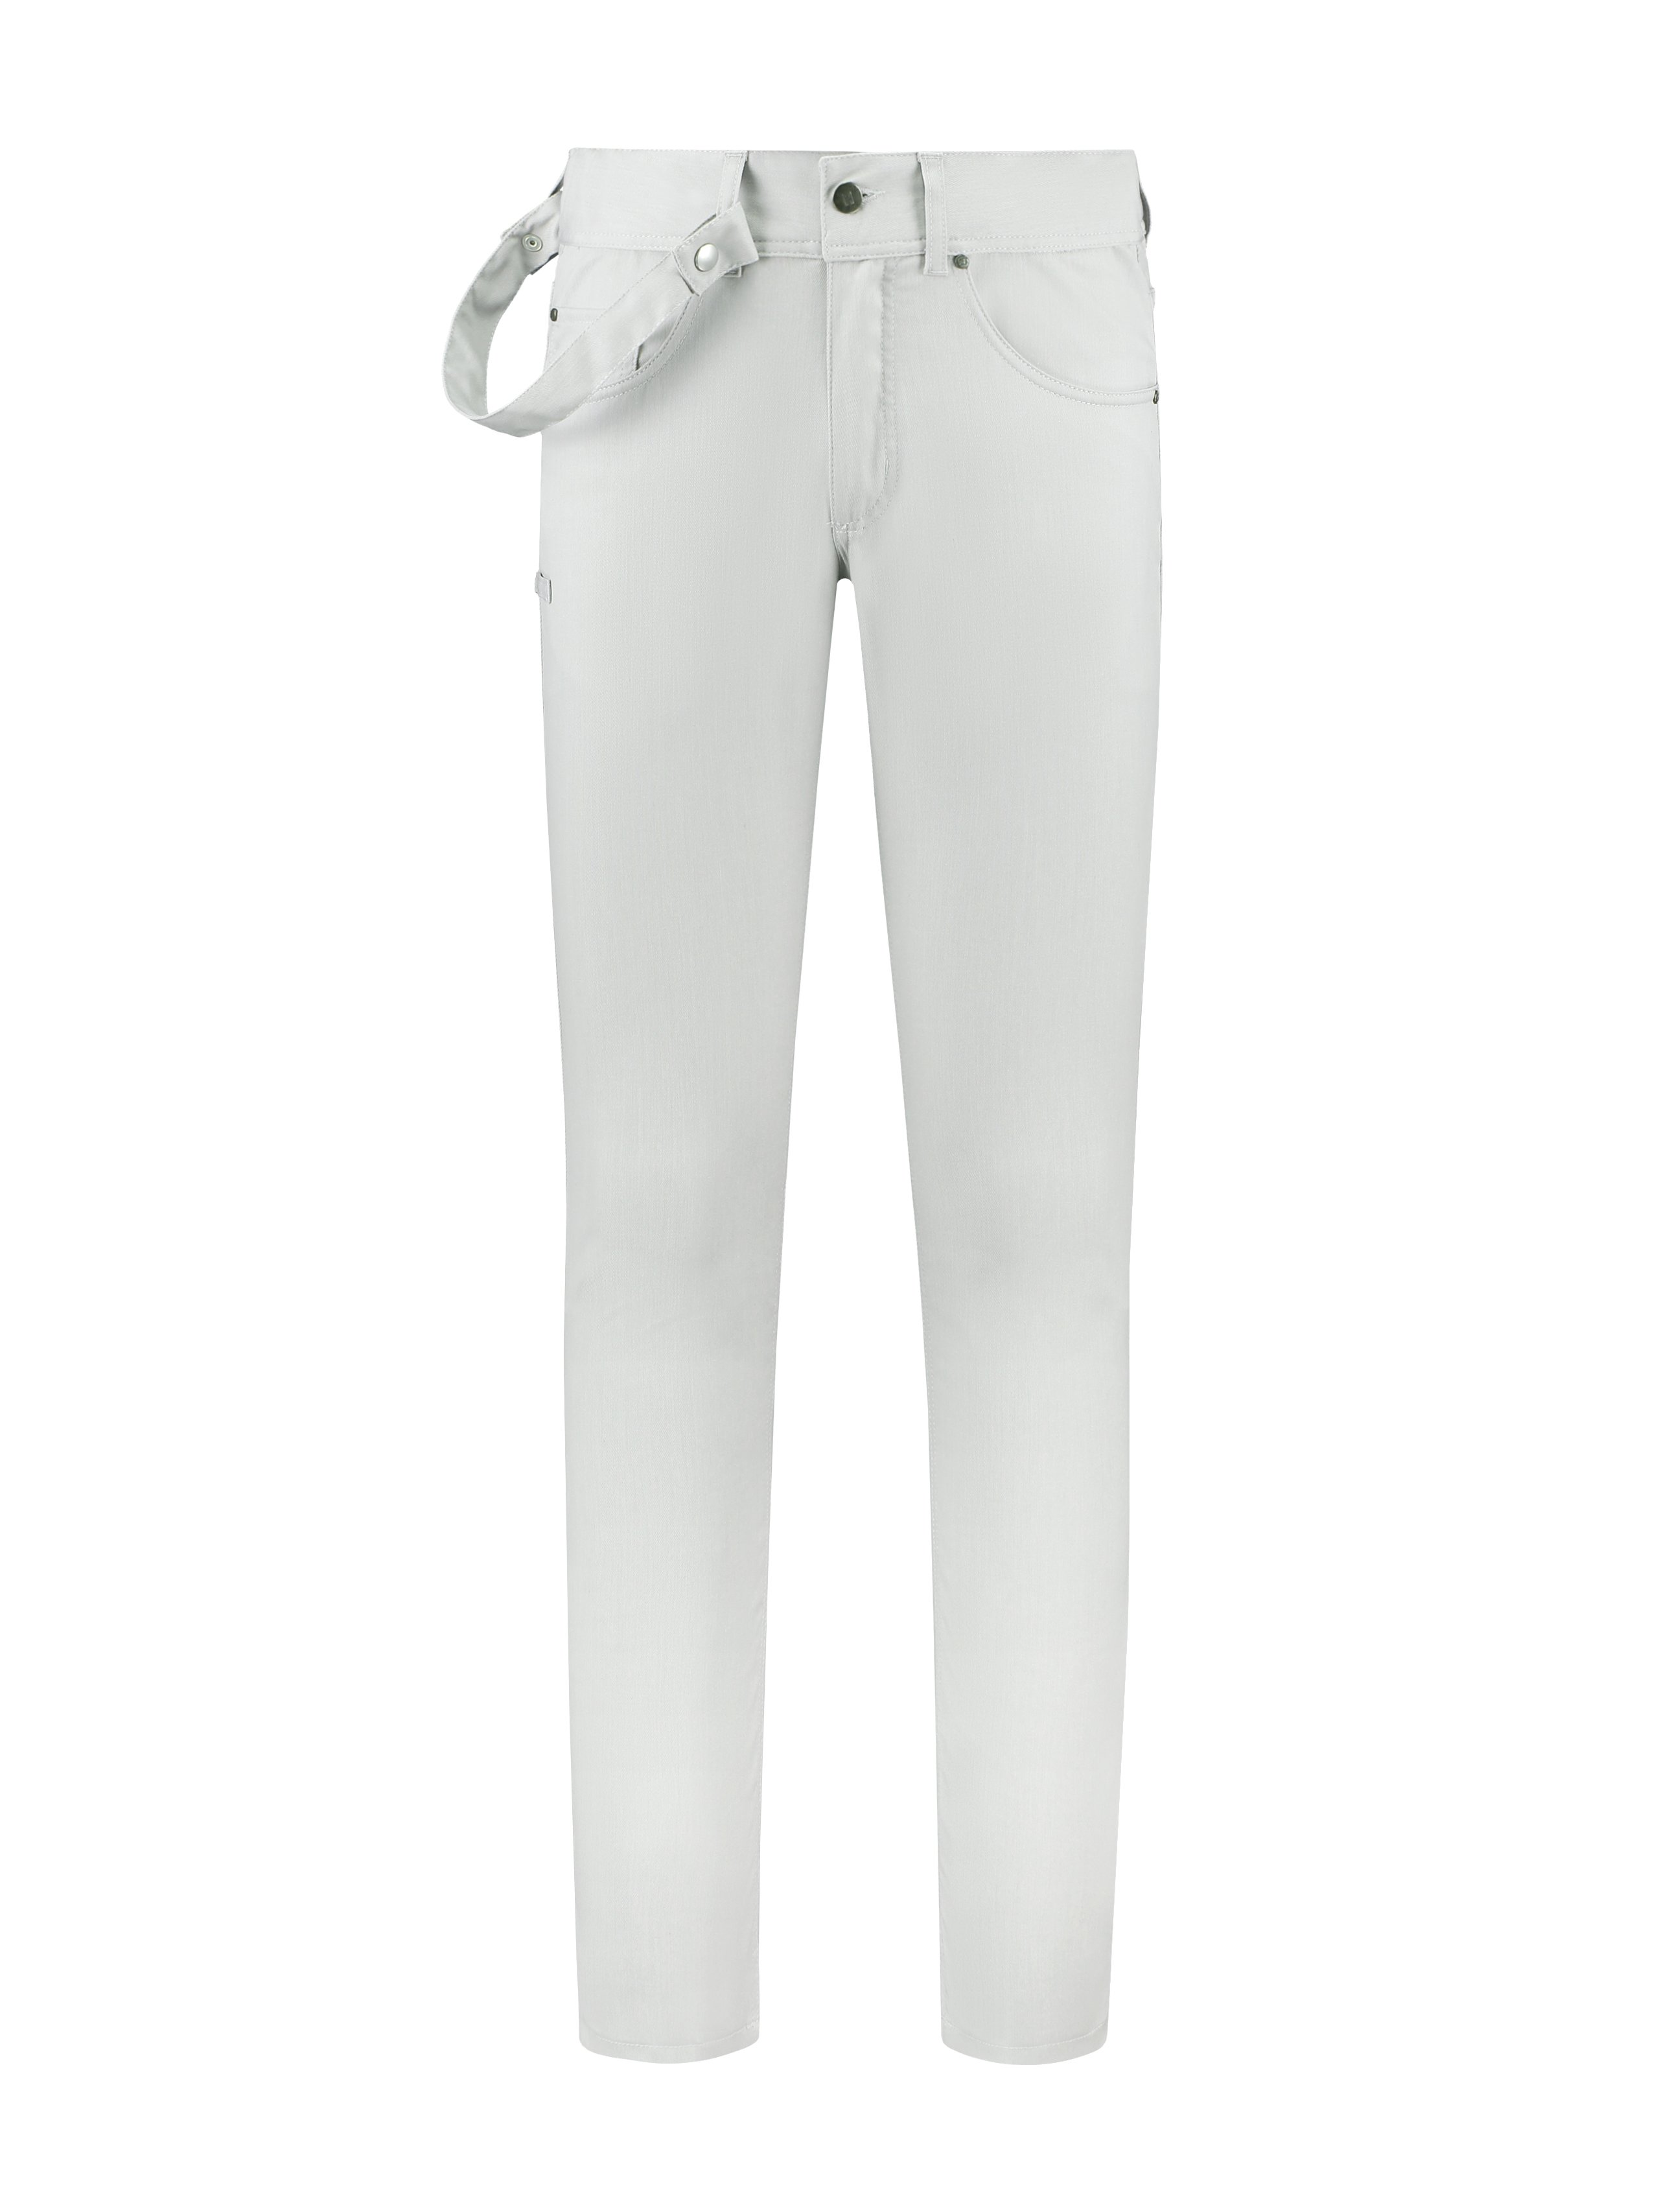 Pants Chicago Grey Denim